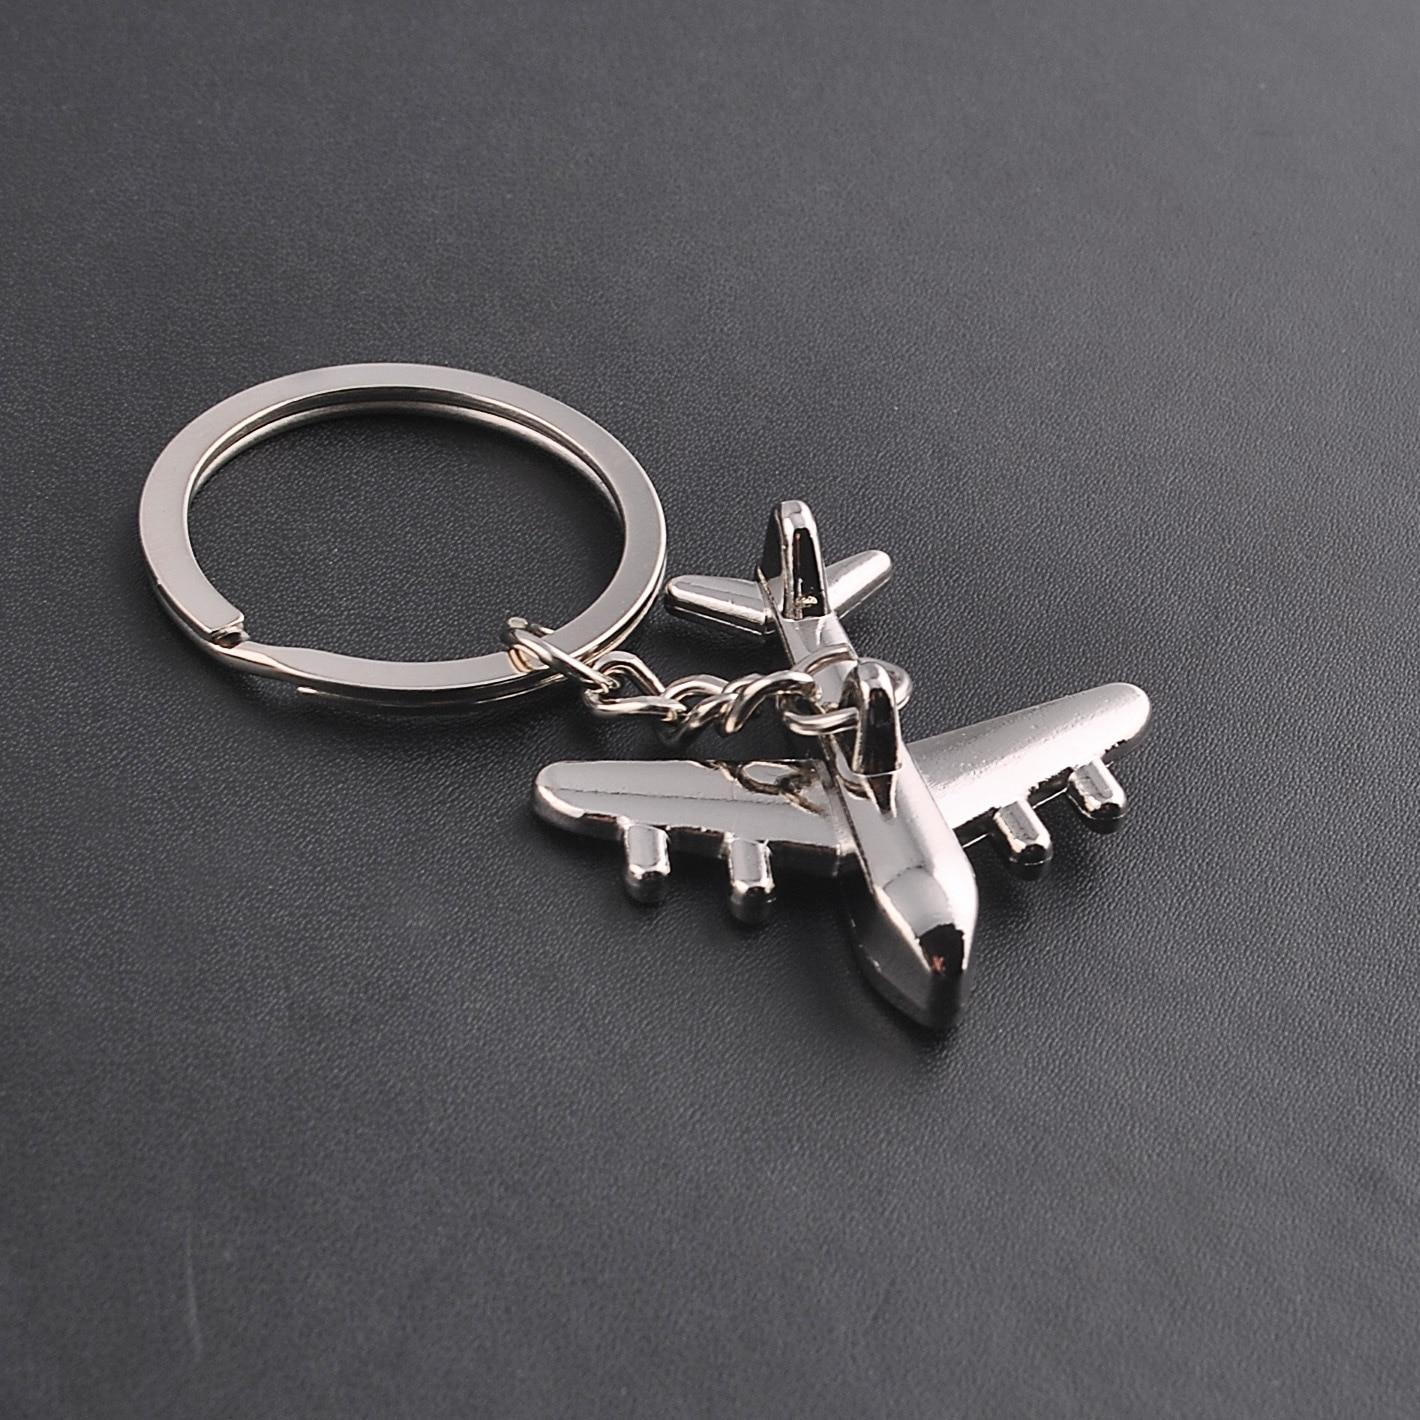 Men New Modern Fighter Aircraft Airplane Key Chain Women Mini aircraft Metal Car Key Ring Bag Pendant best Gift wholesale